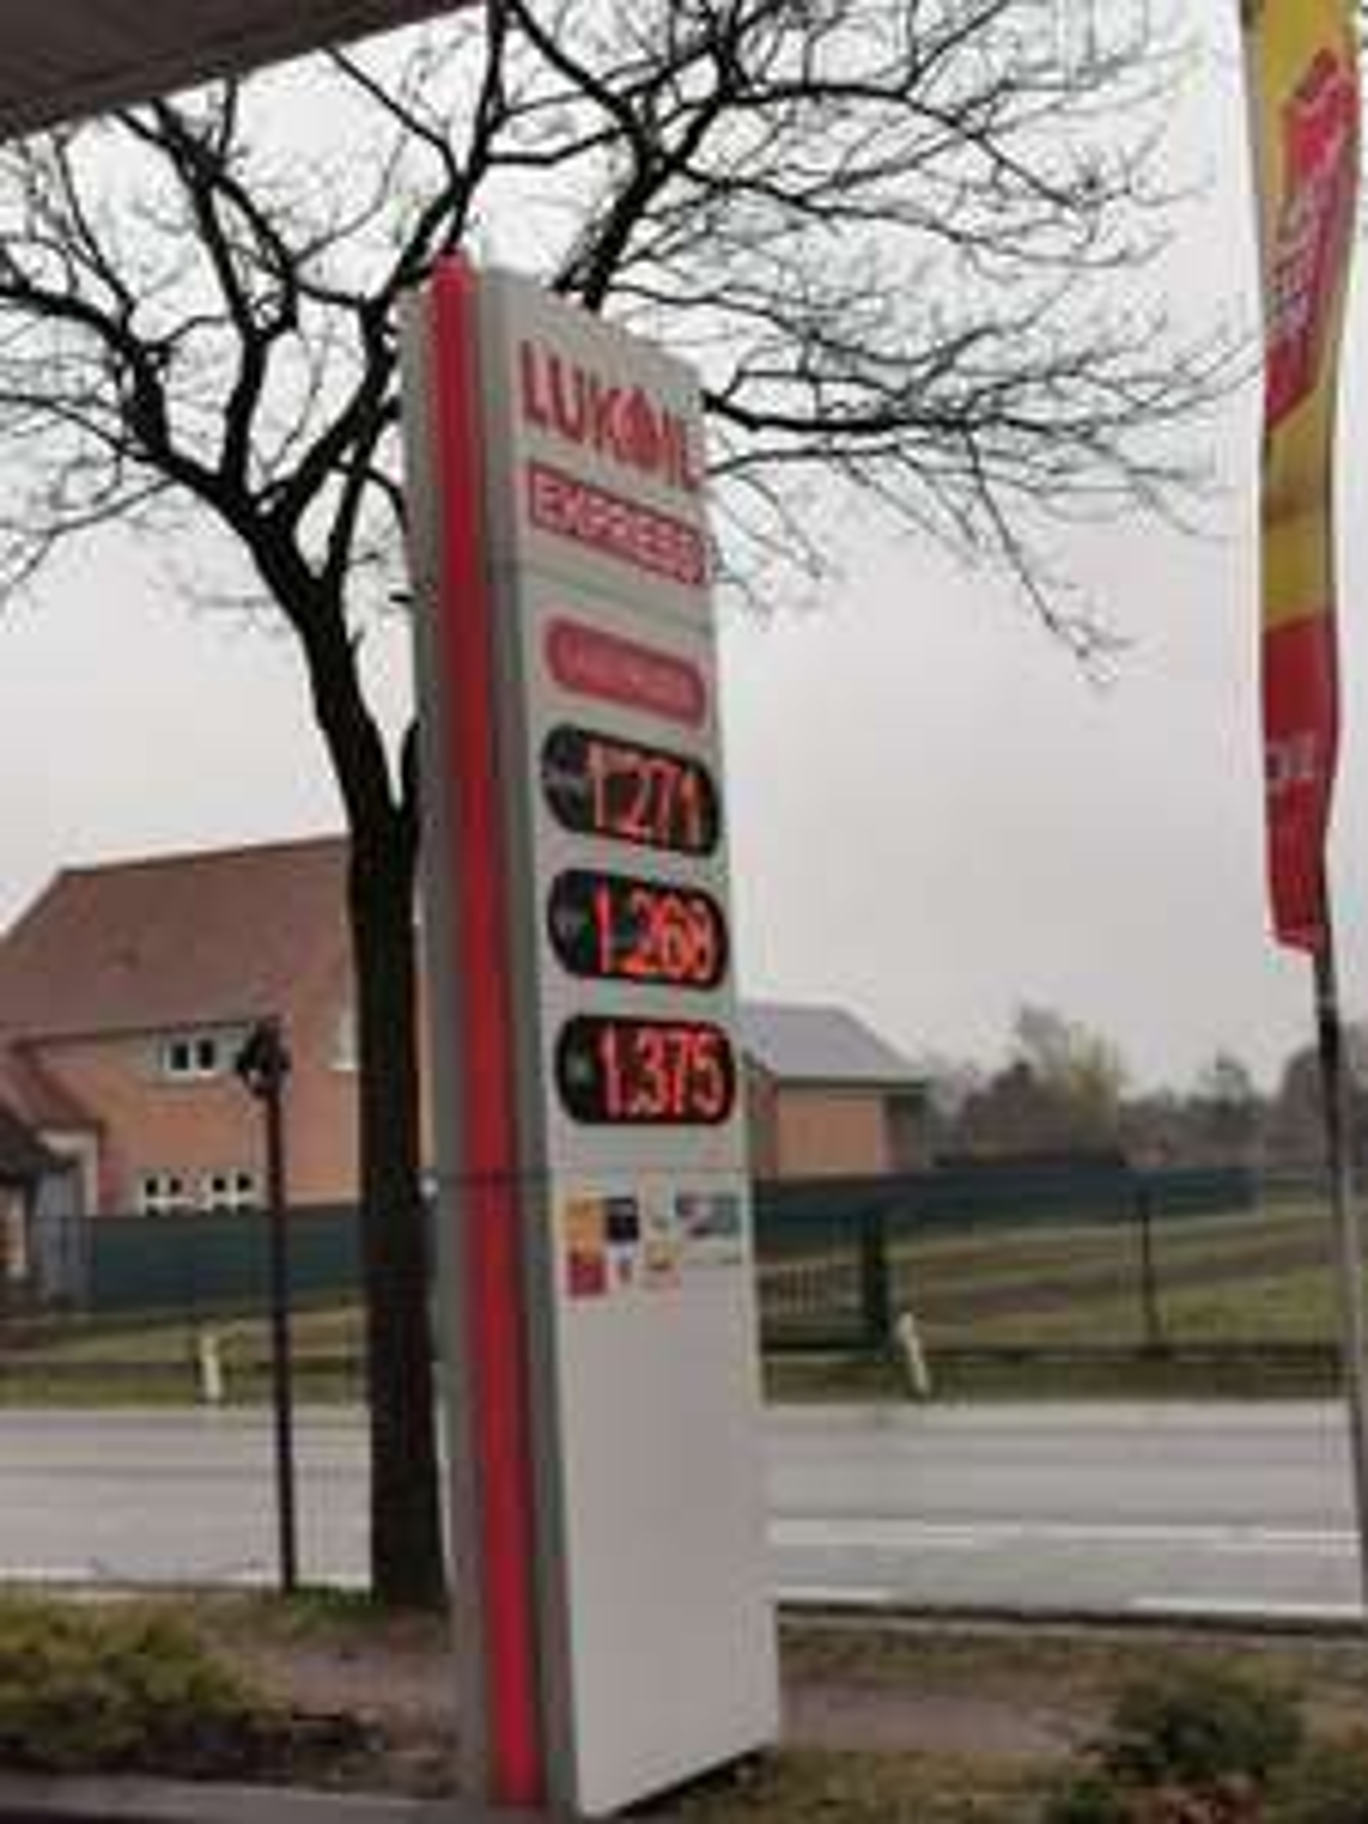 (België) Lukoil, €1,268 benzine, 1,271 diesel